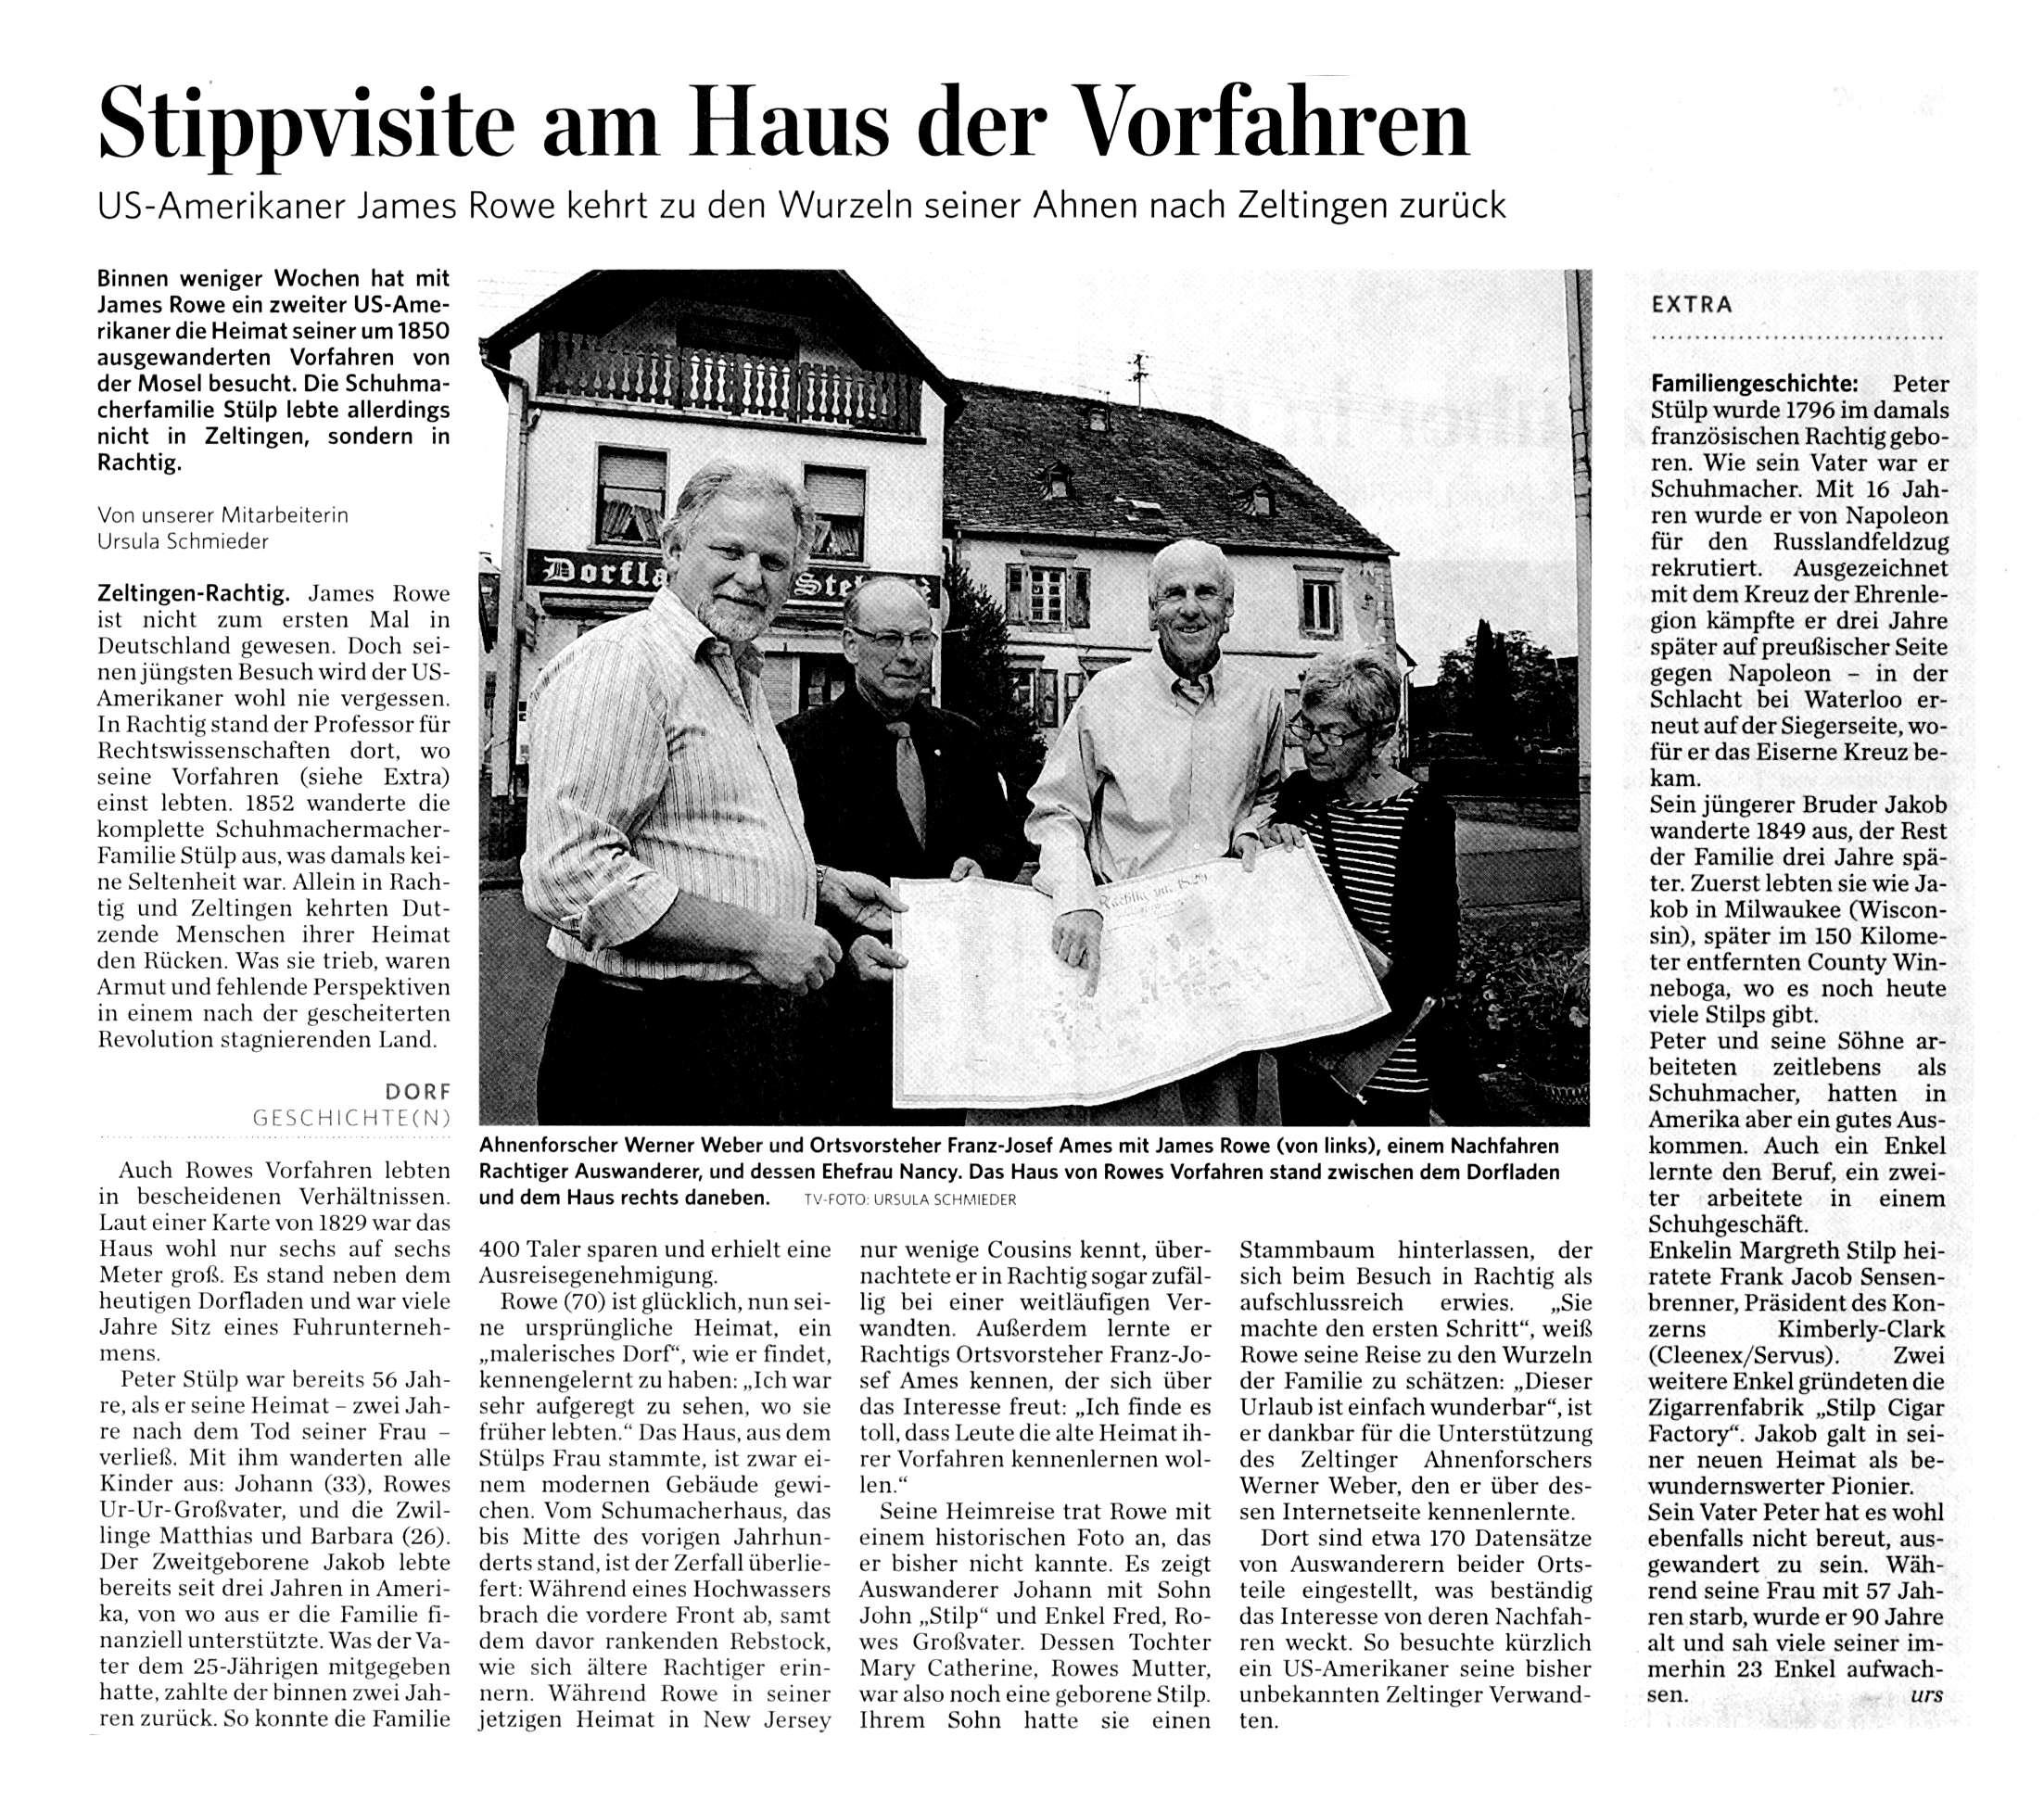 presse 2013-11-14